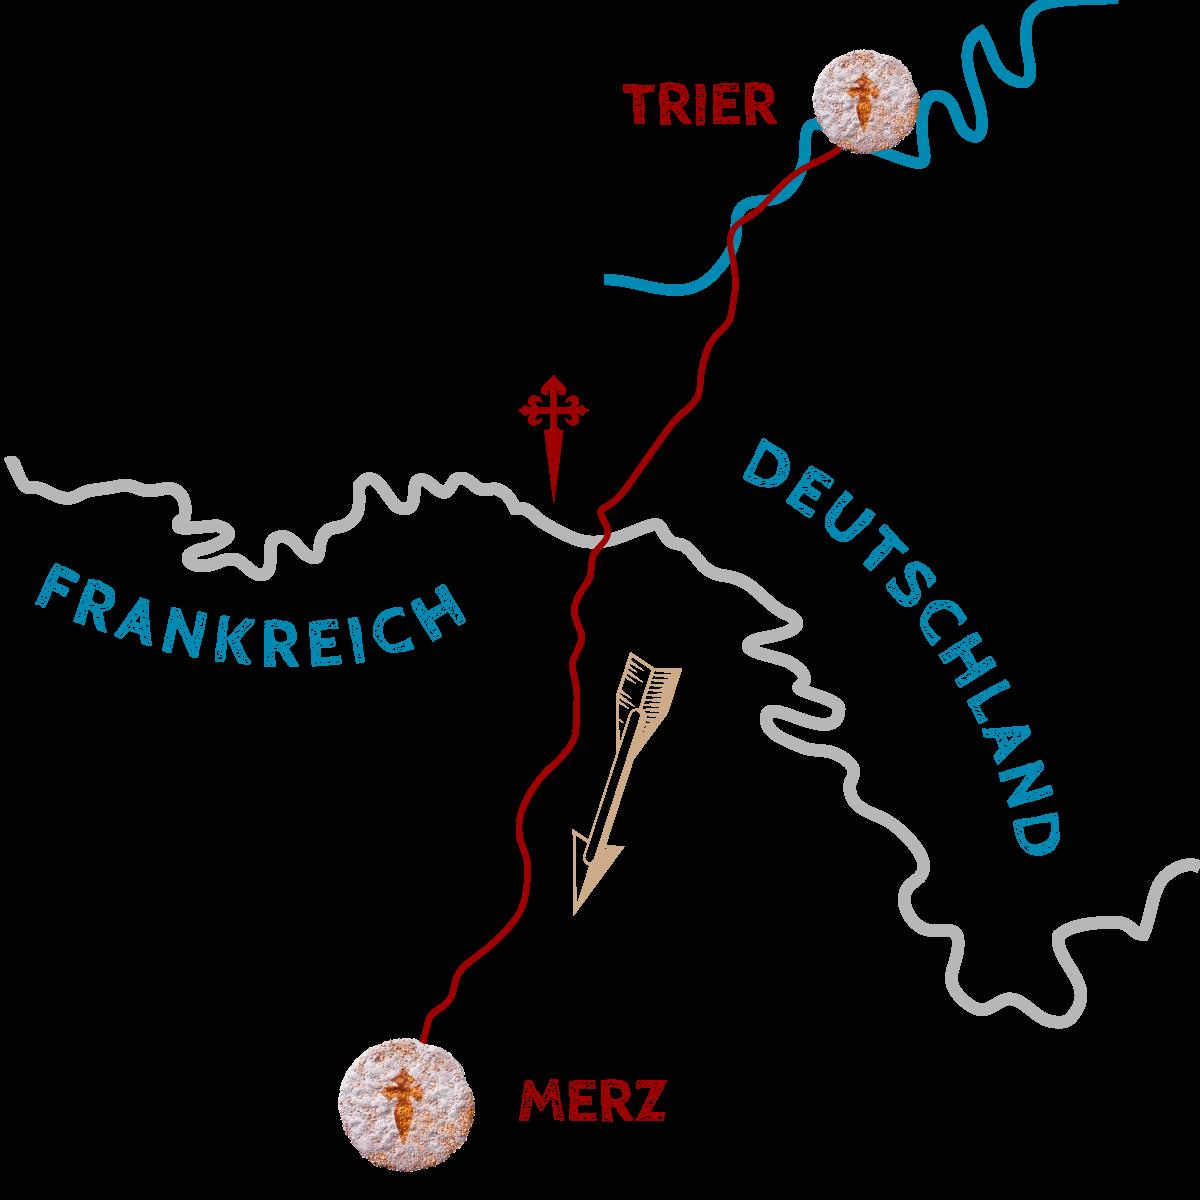 Wegegrafik-JUGENDHILFEZENTRUM-BERNHARDSHOF---GRUPPE-LEONARD-2